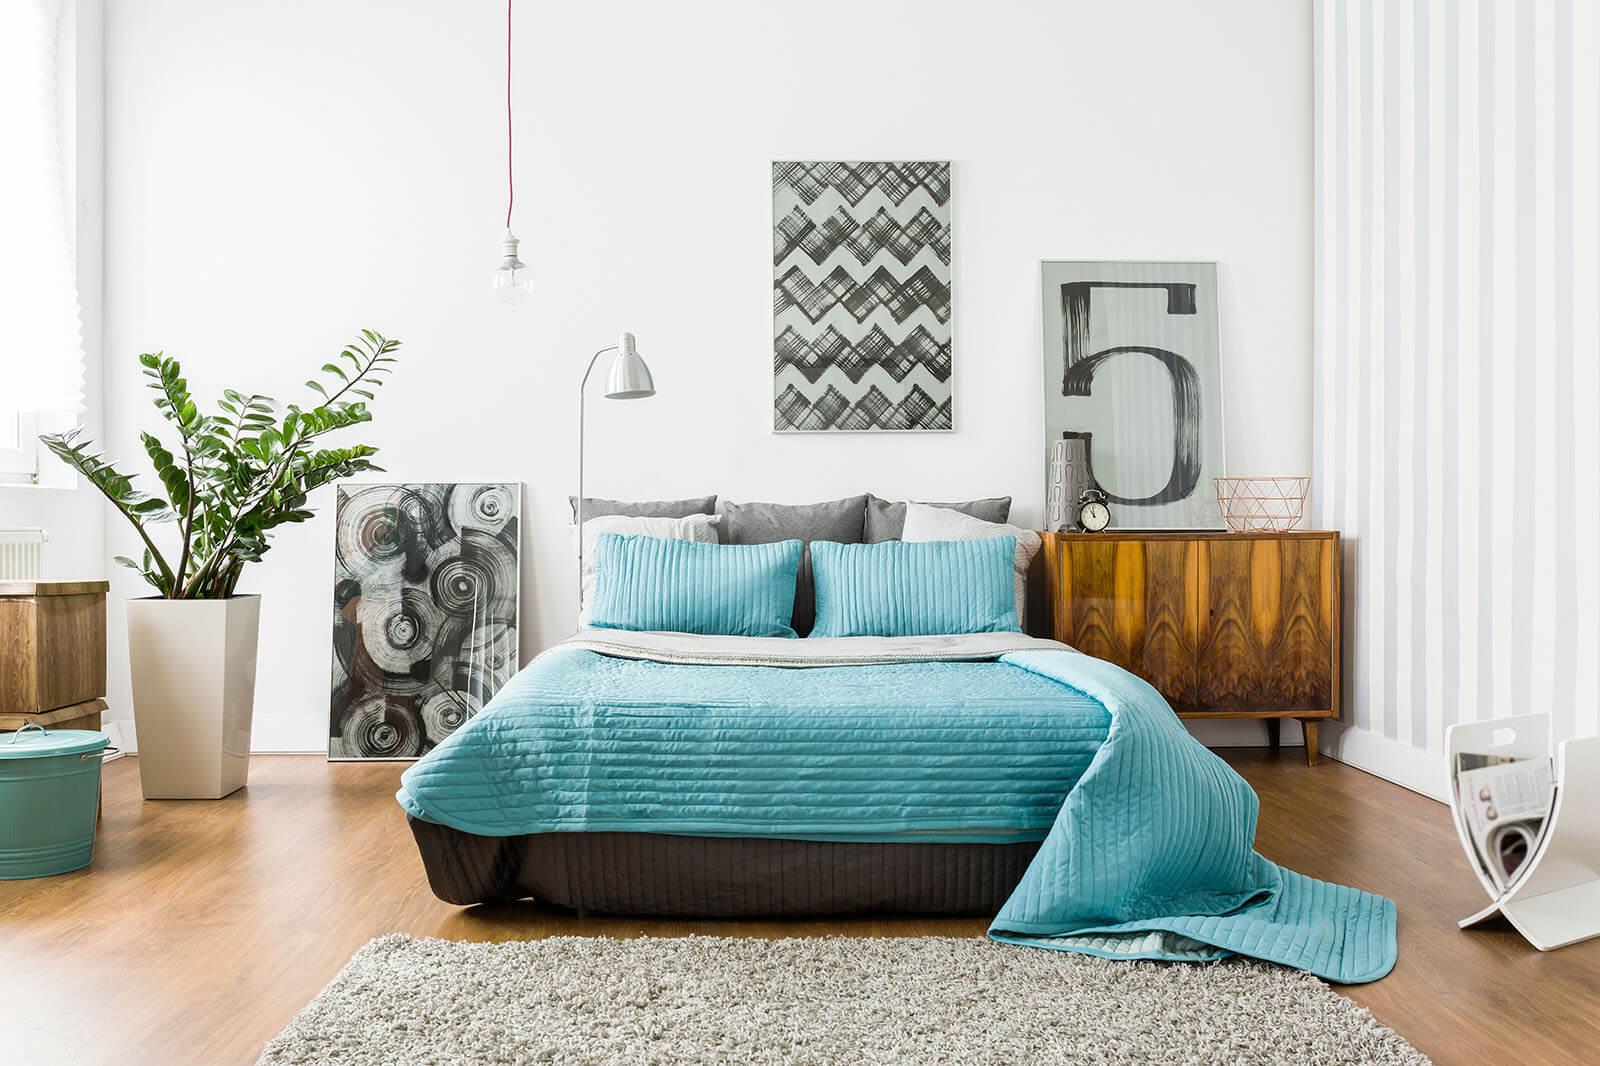 Donkere laminaat vloer in slaapkamer